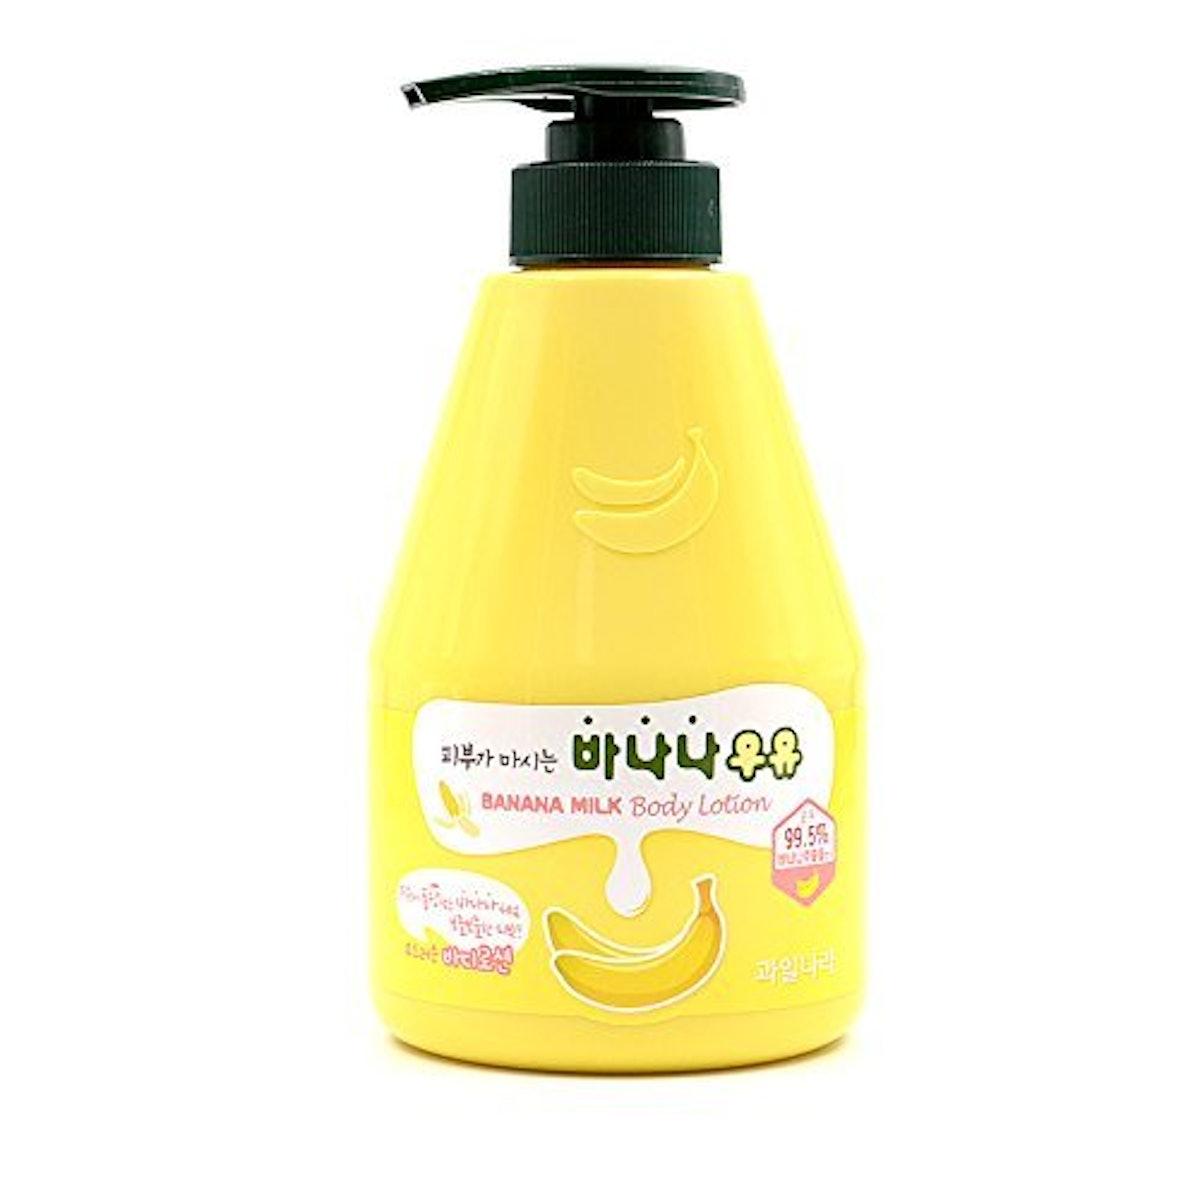 Kwailnara Banana Milk Body Lotion